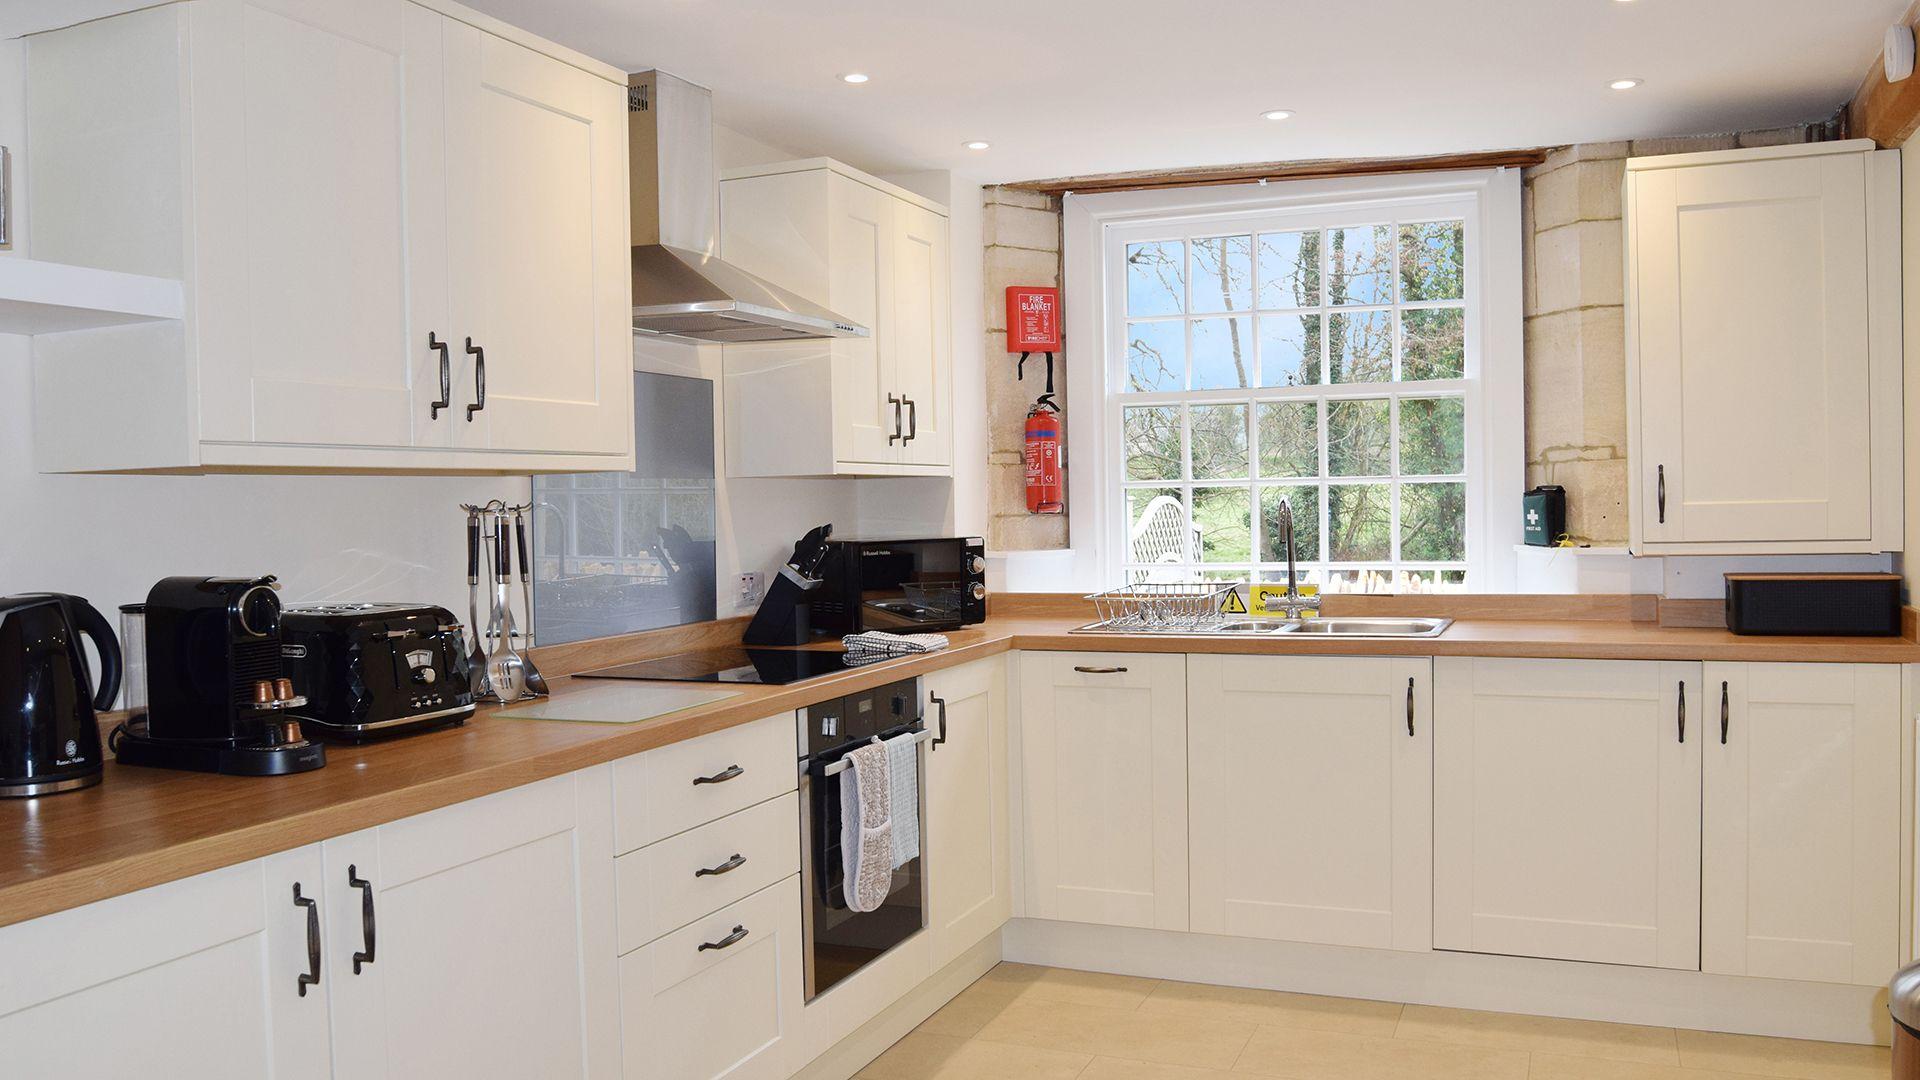 Kitchen, Lady Jane Grey Cottage at Sudeley Castle, Bolthole Retreats